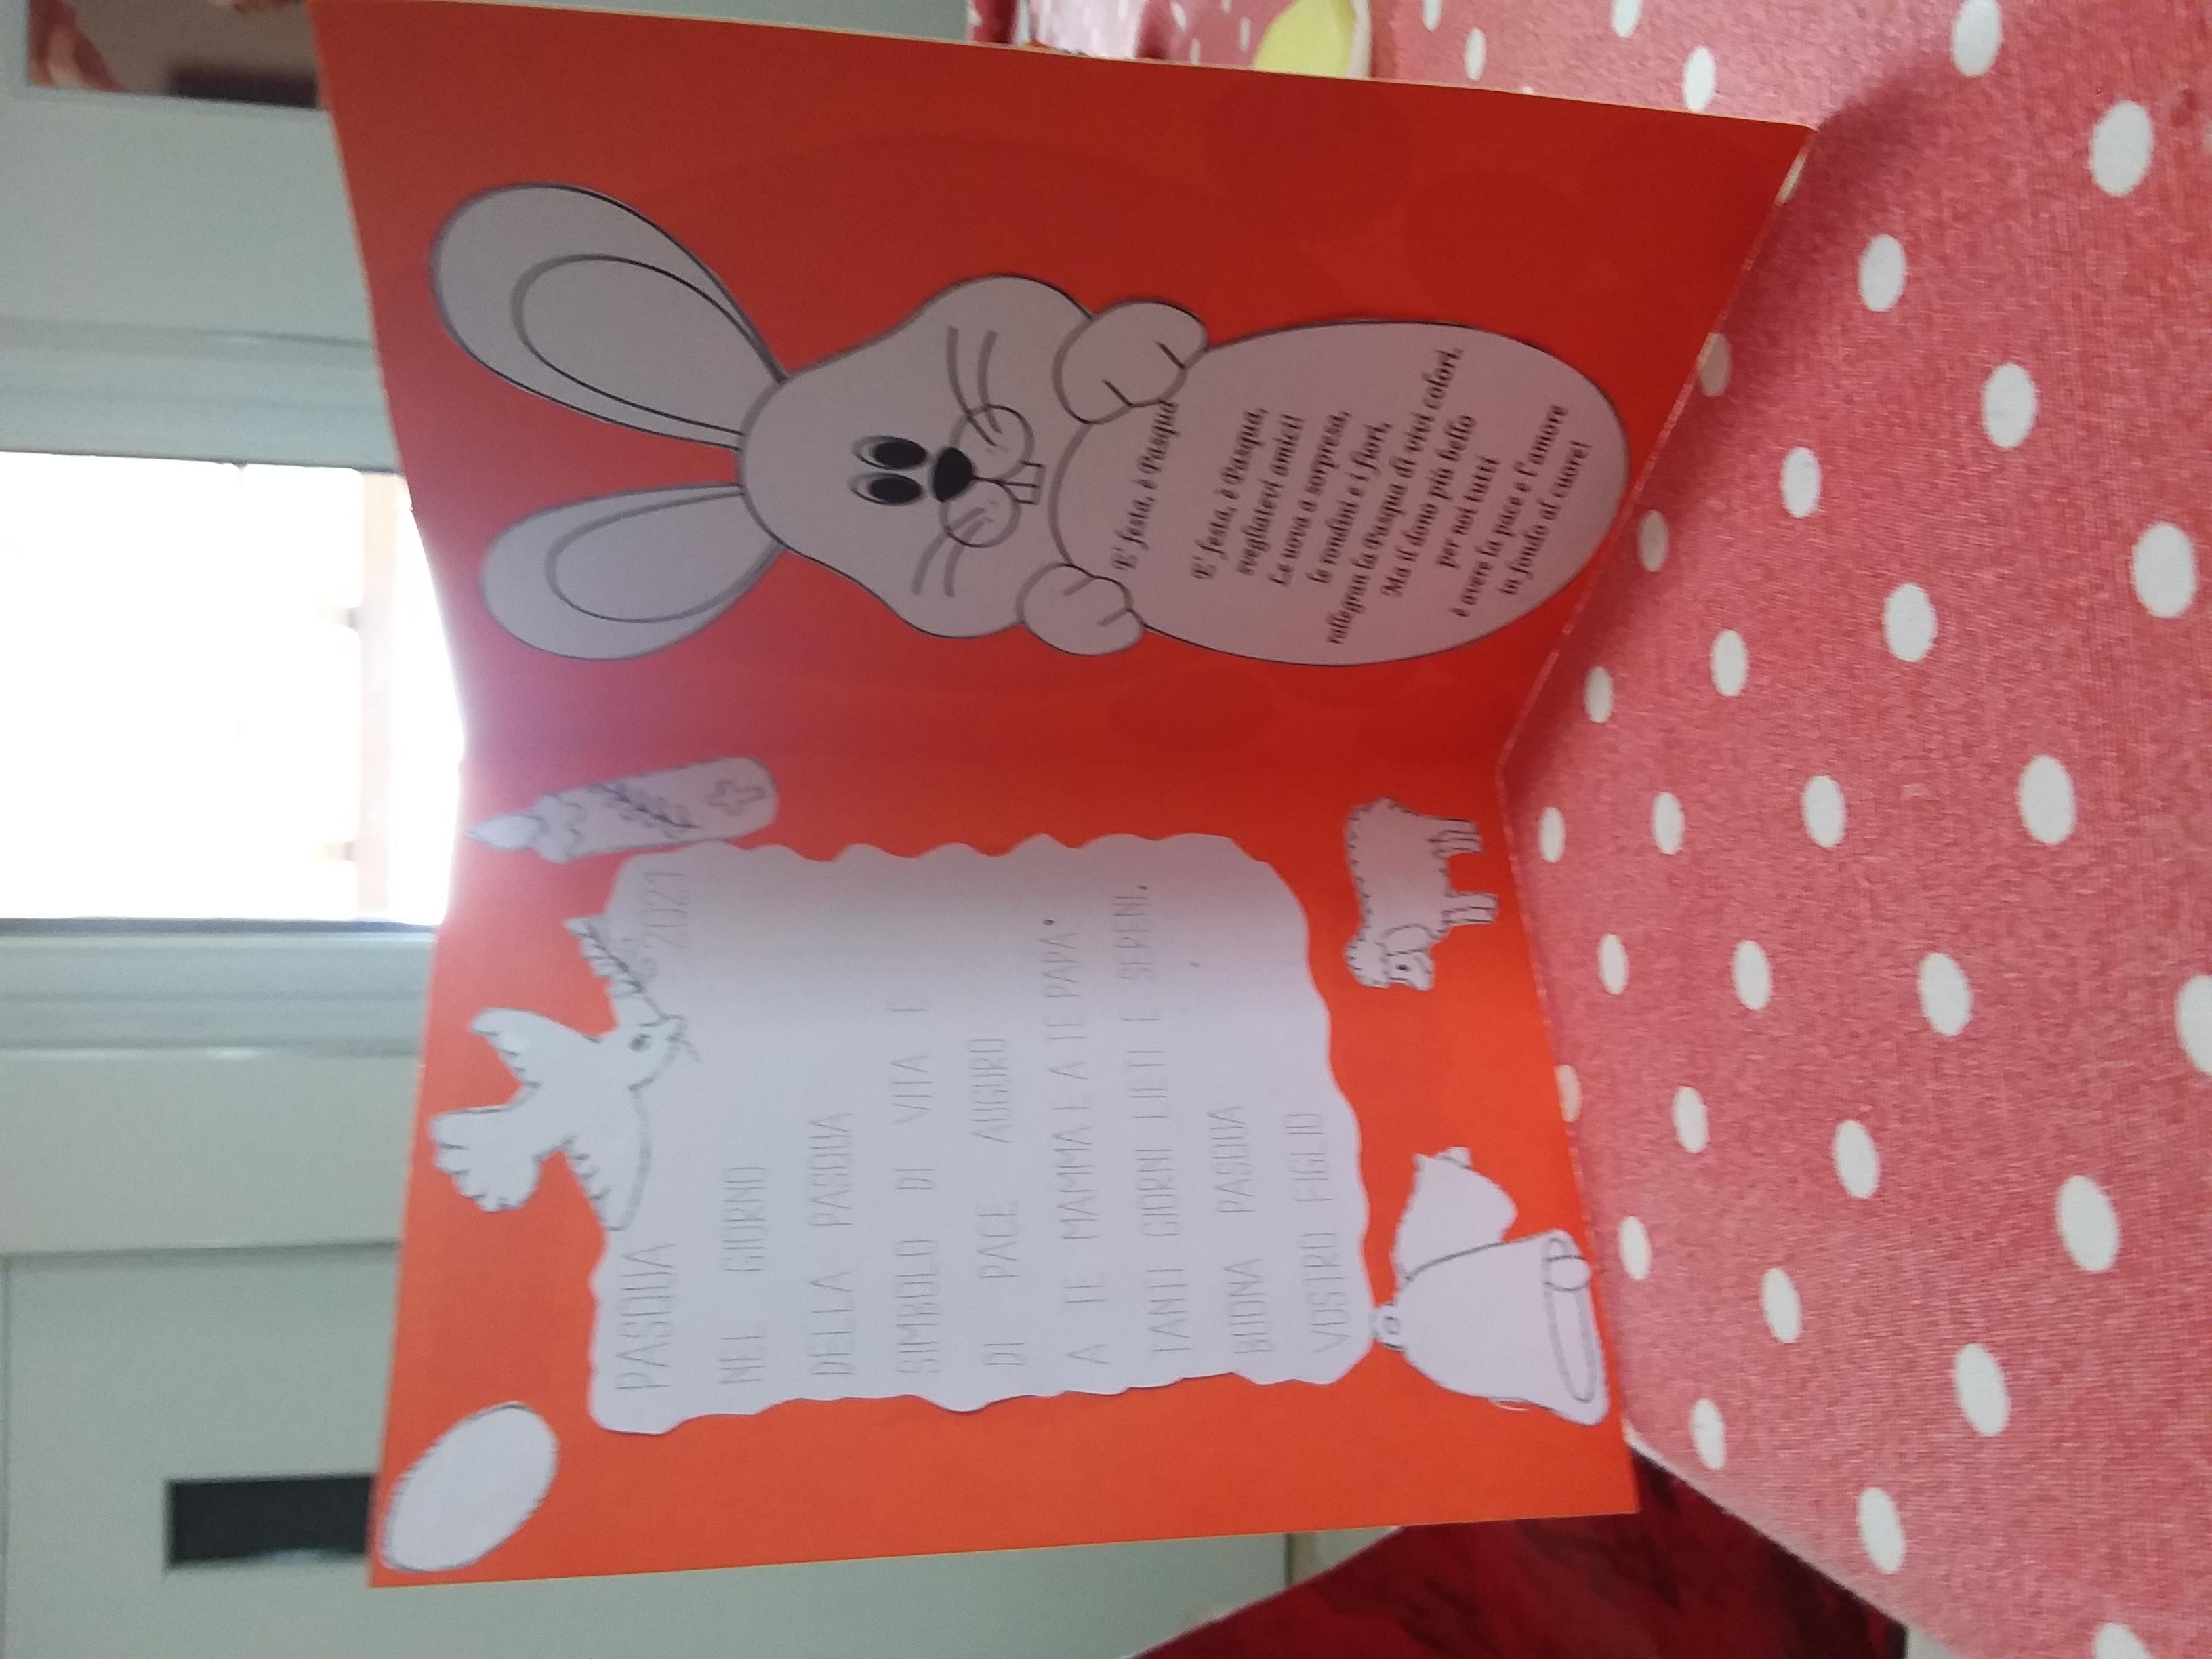 La nostra Pasqua